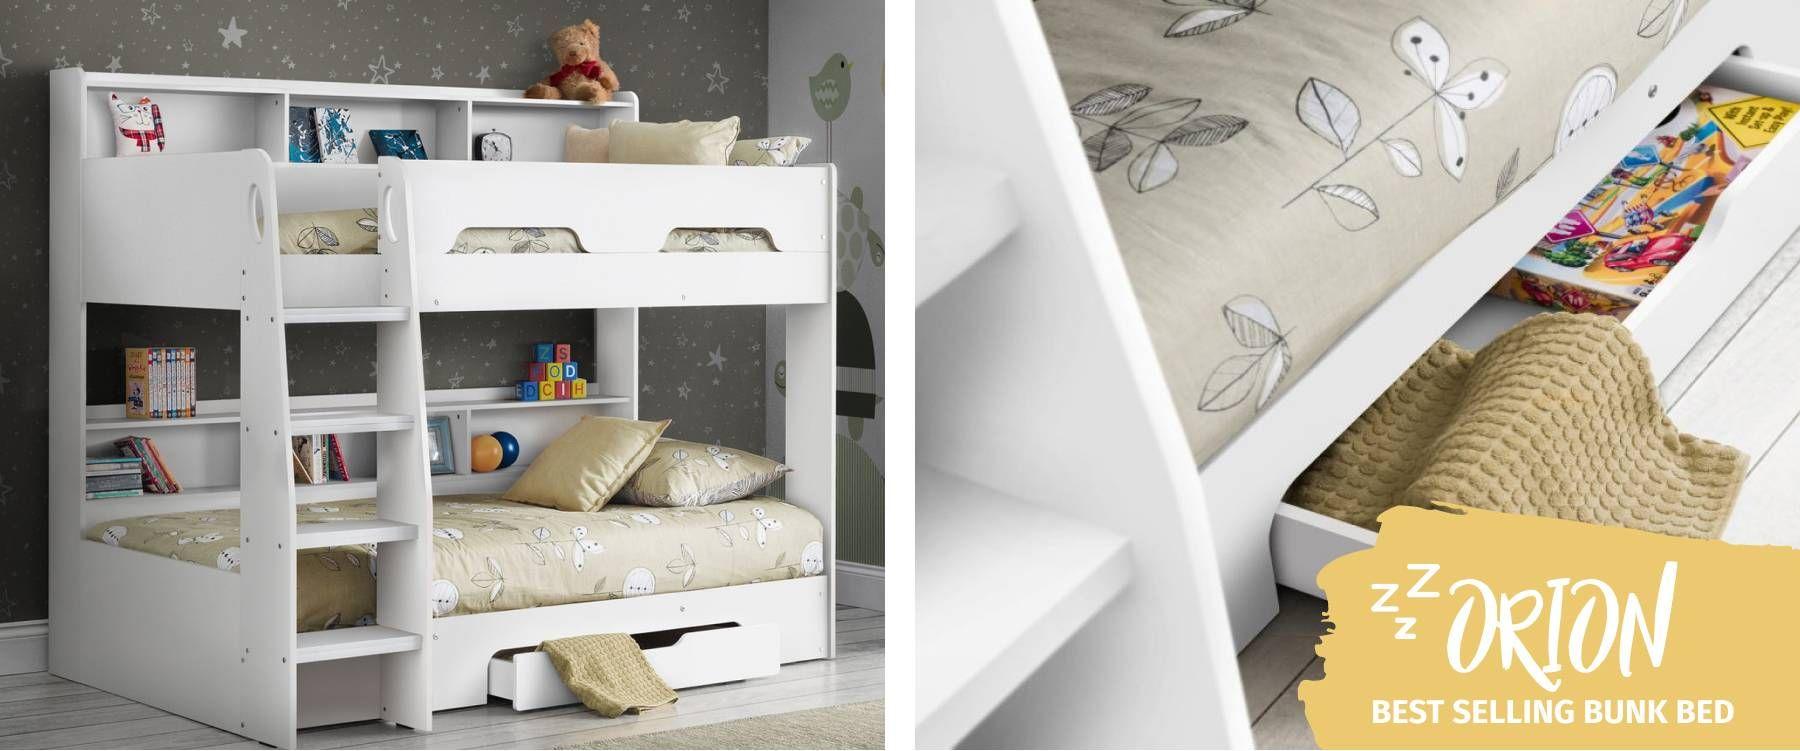 Pin by jenifer dun on bedroom ideas inspiration in pinterest